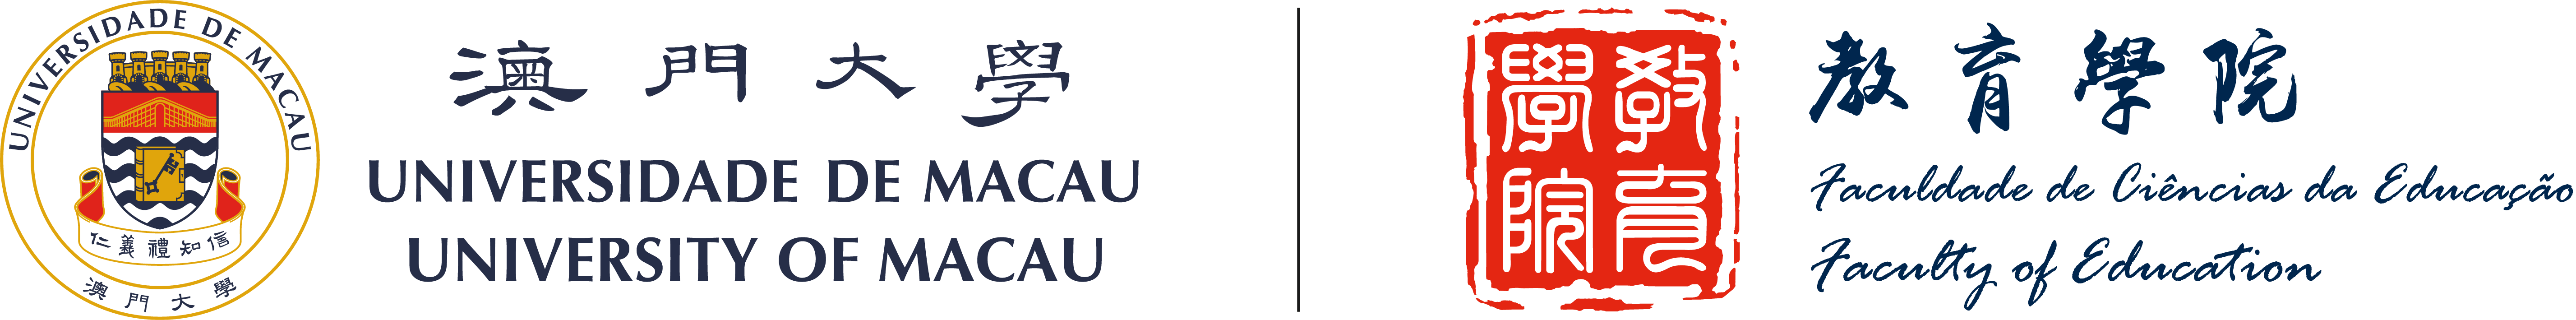 Faculty of Education | University of Macau Logo